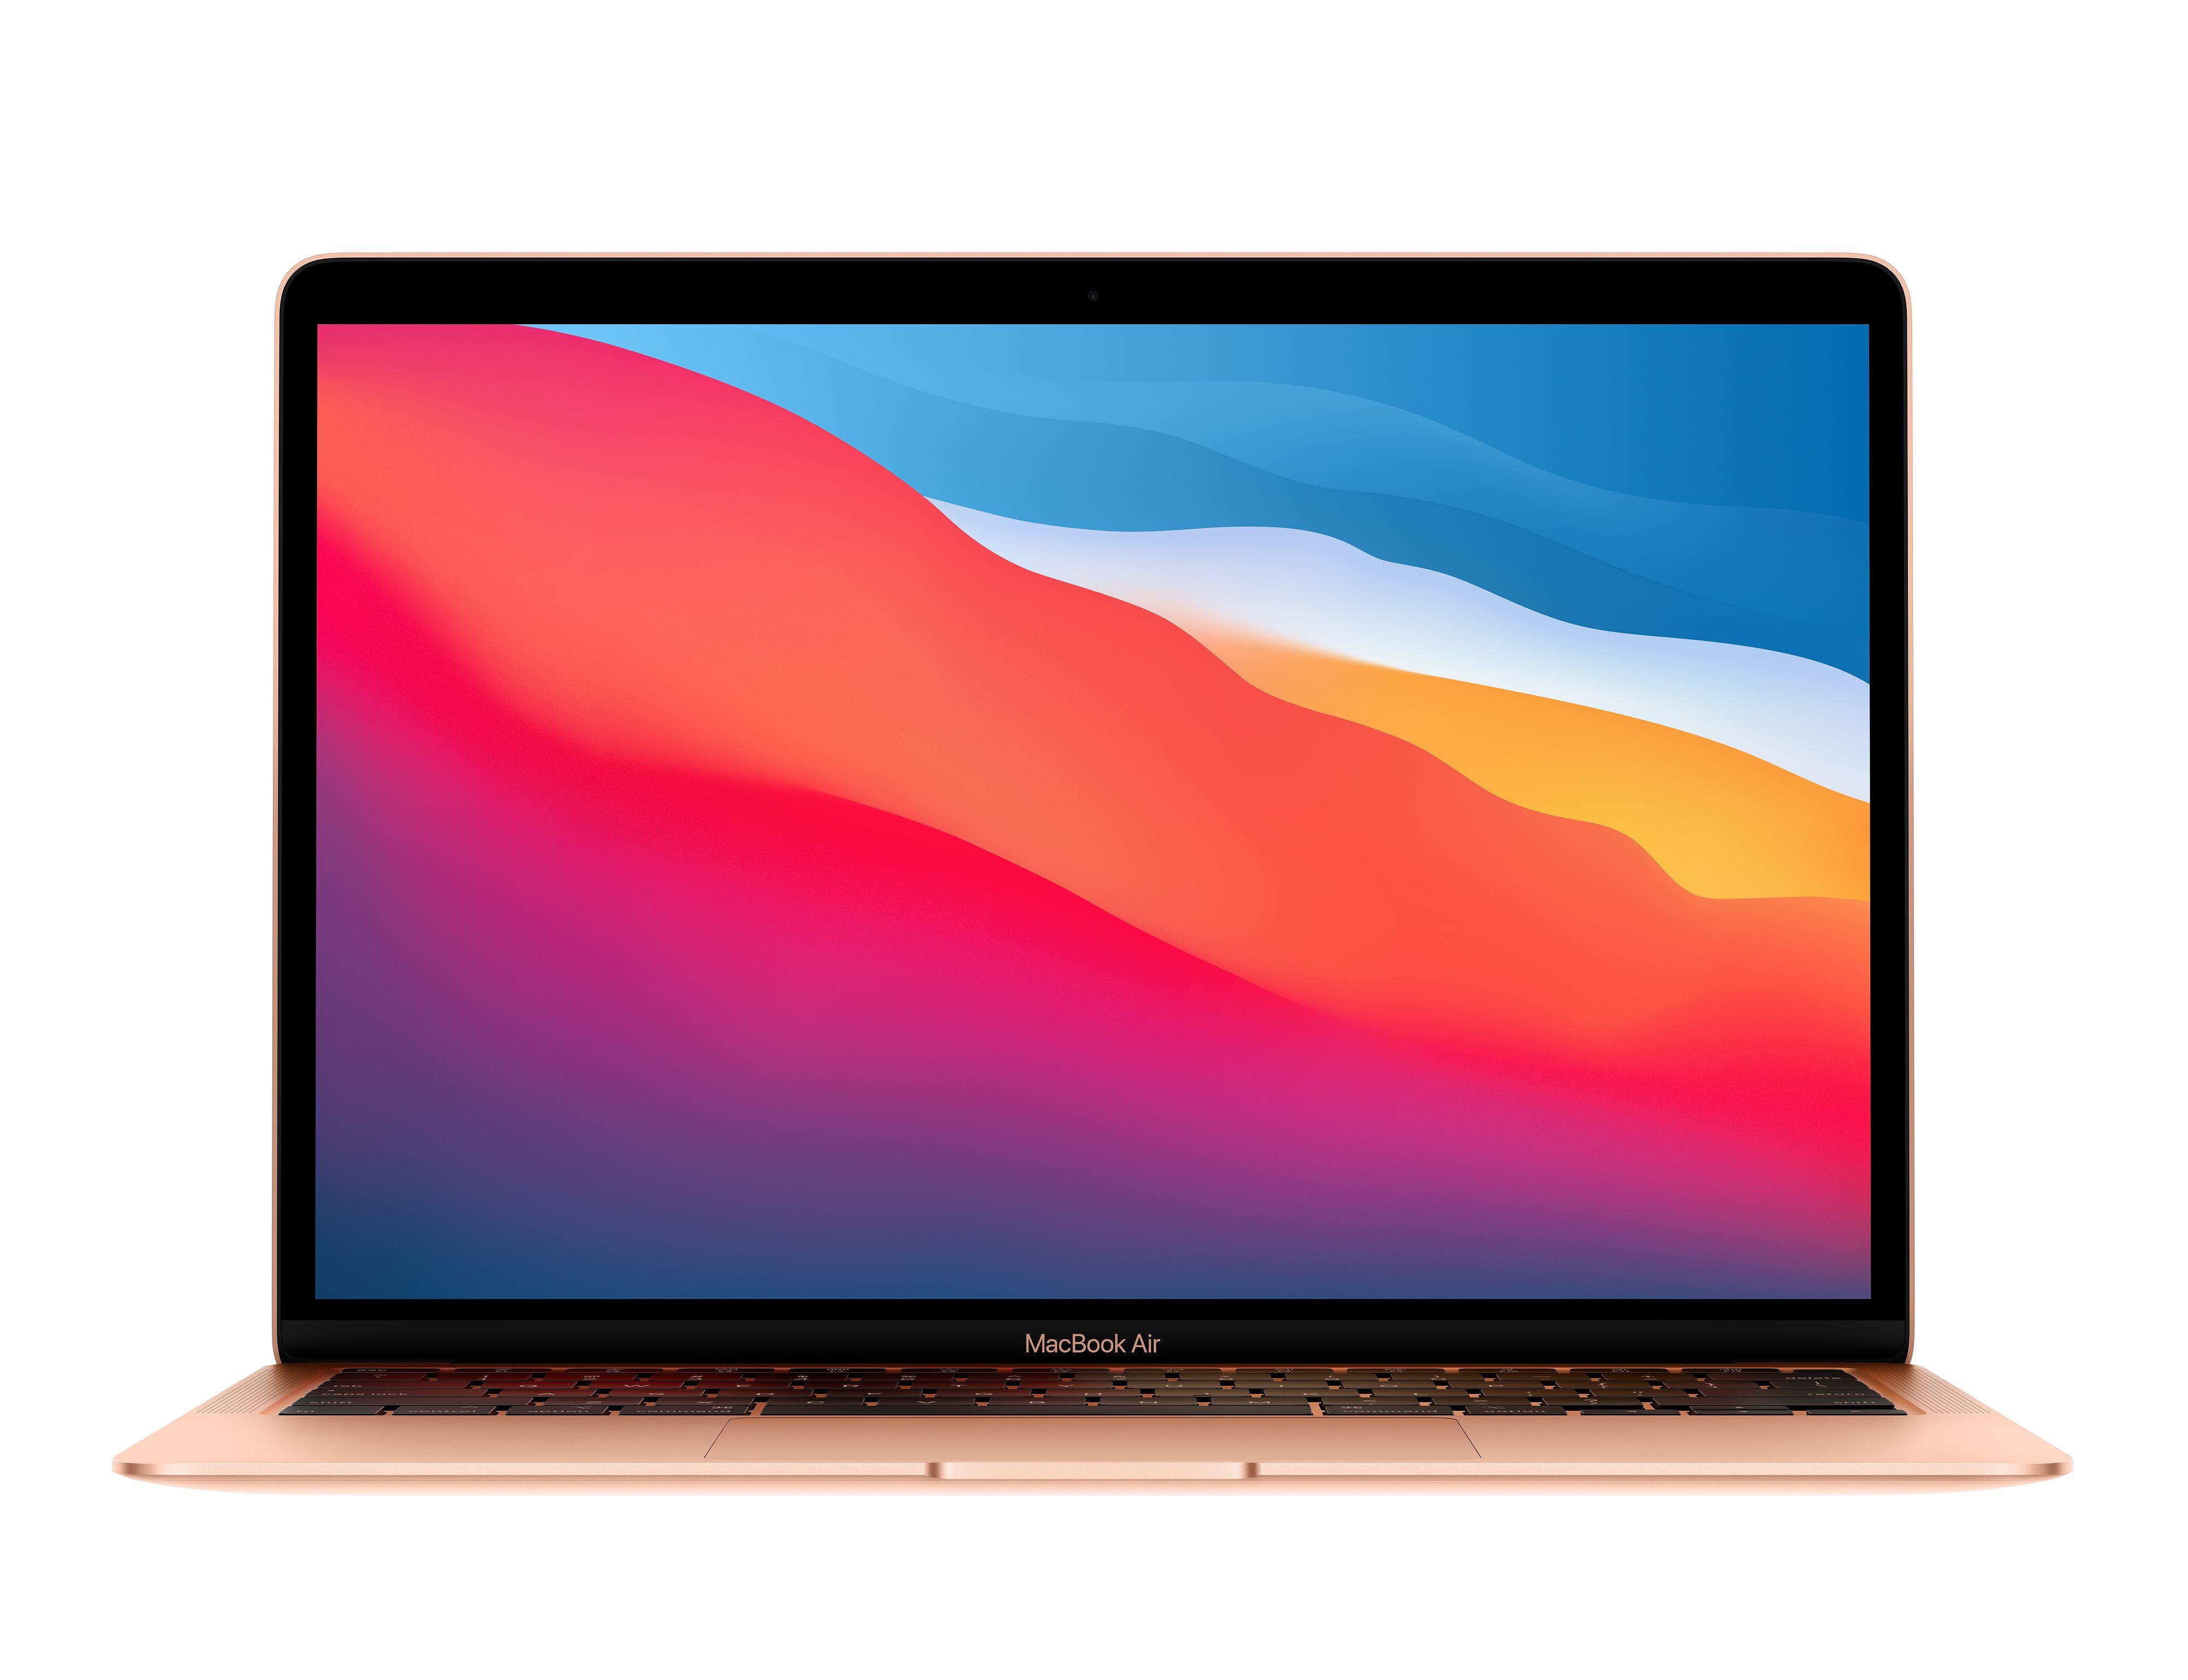 macbook-air-2020-256gb-gold-m1-fpt